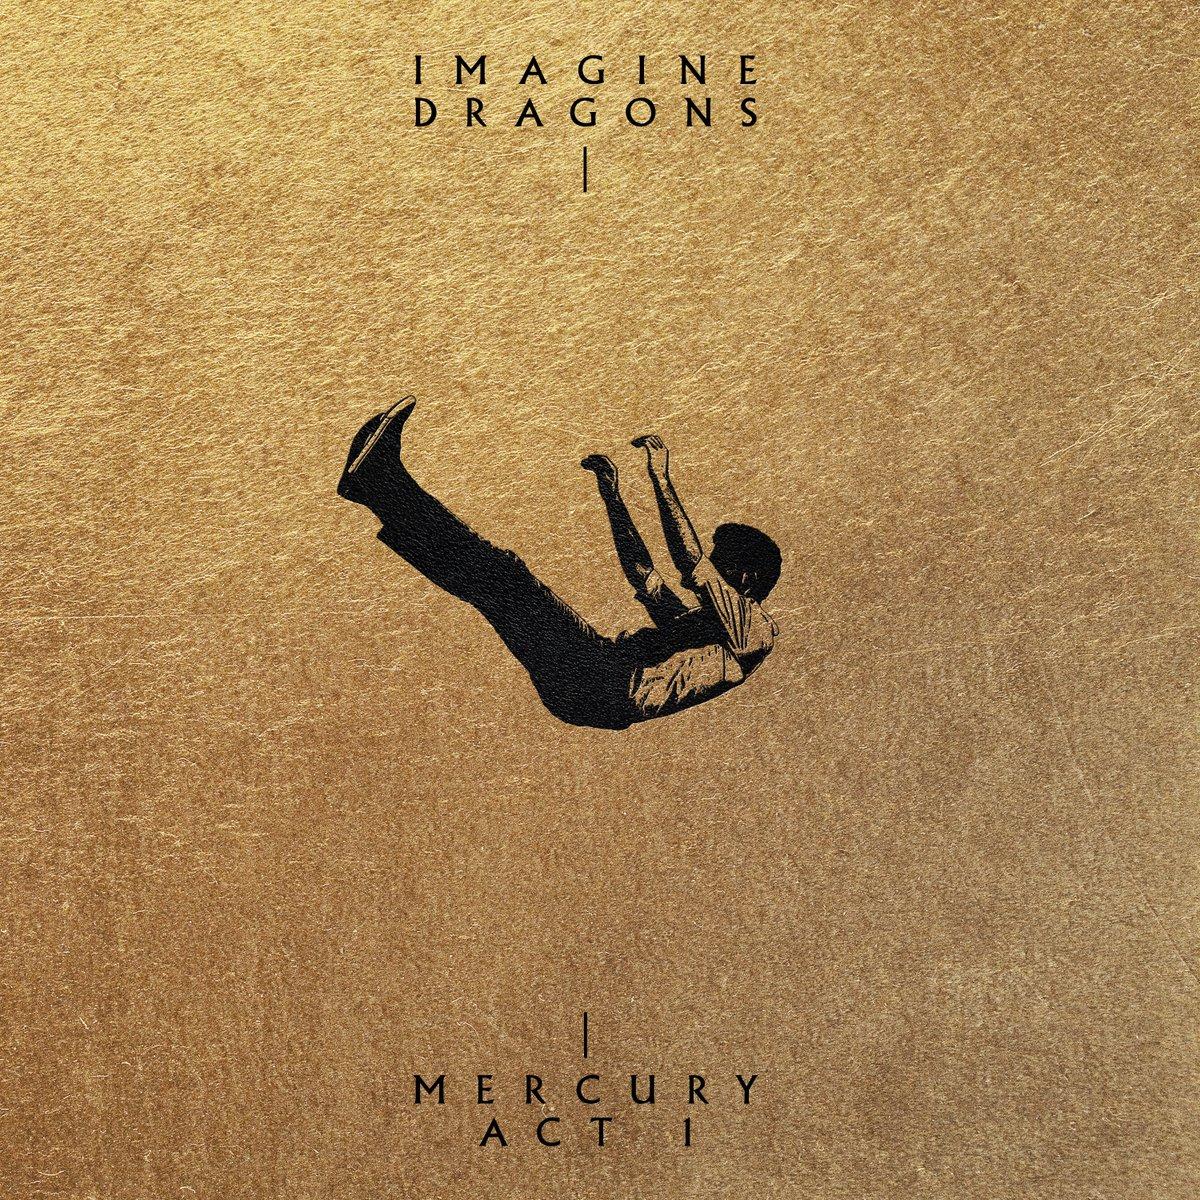 Imagine Dragons (@Imaginedragons) | Twitter